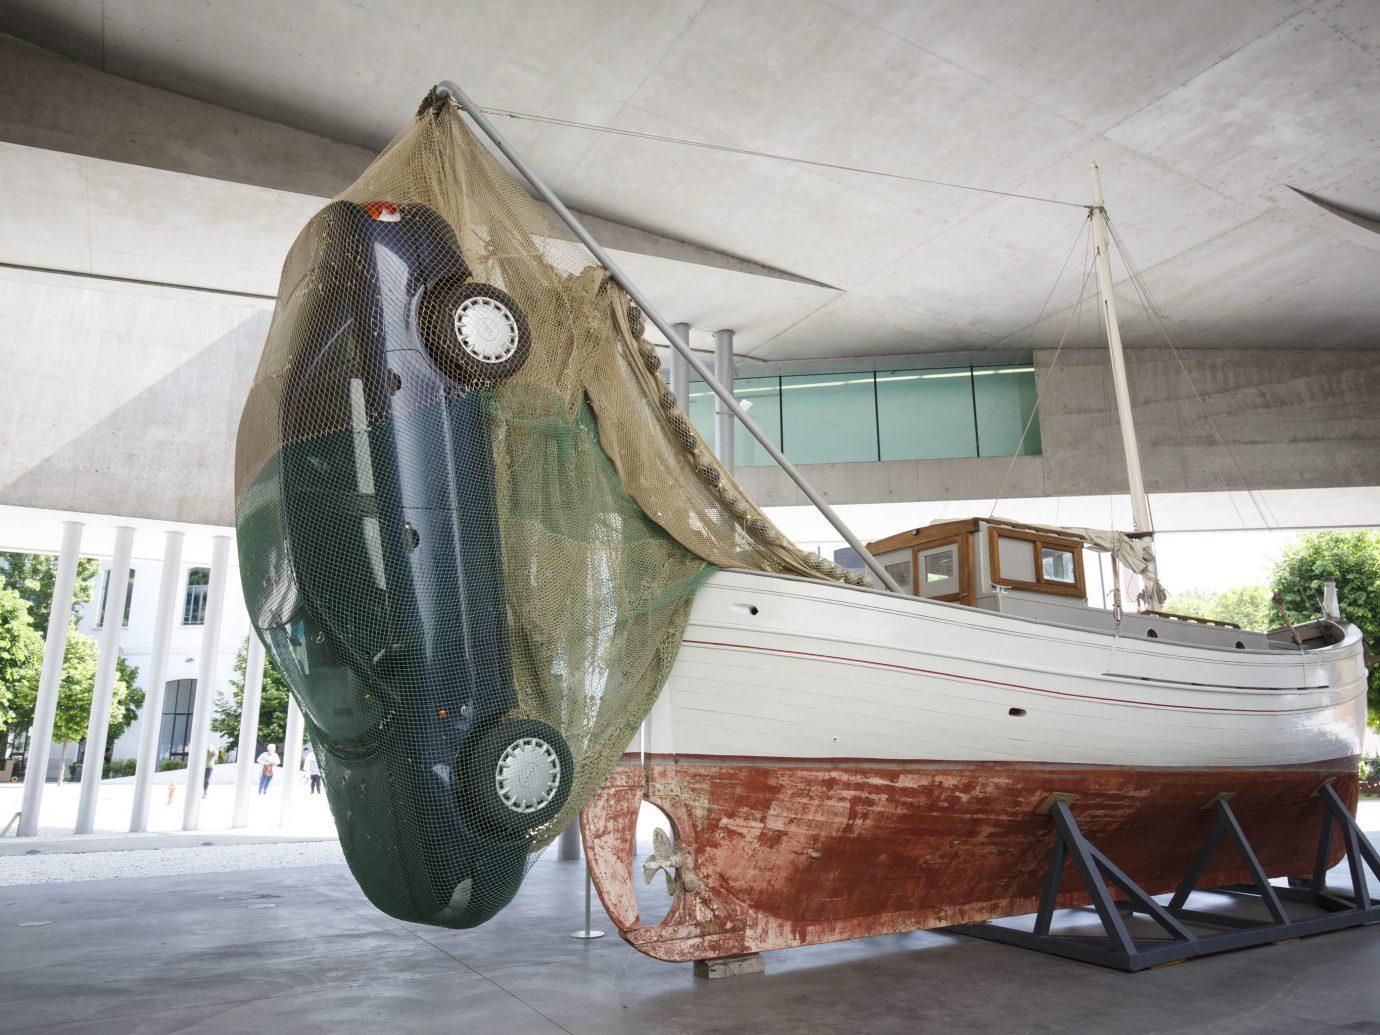 Arts + Culture indoor vehicle Boat